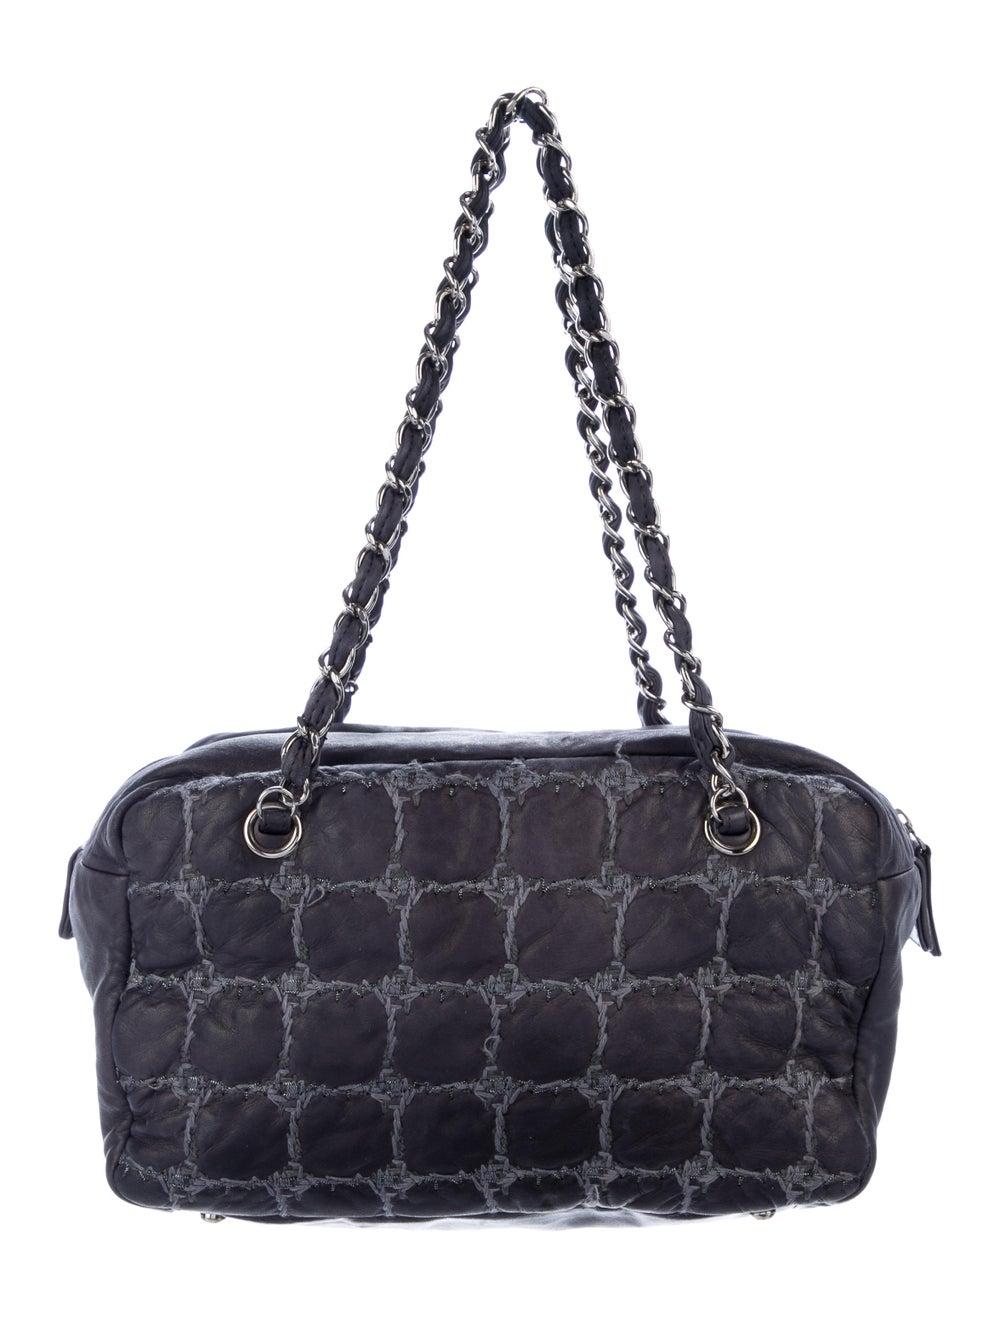 Chanel Tweed Stitch Bowler Bag Blue - image 3